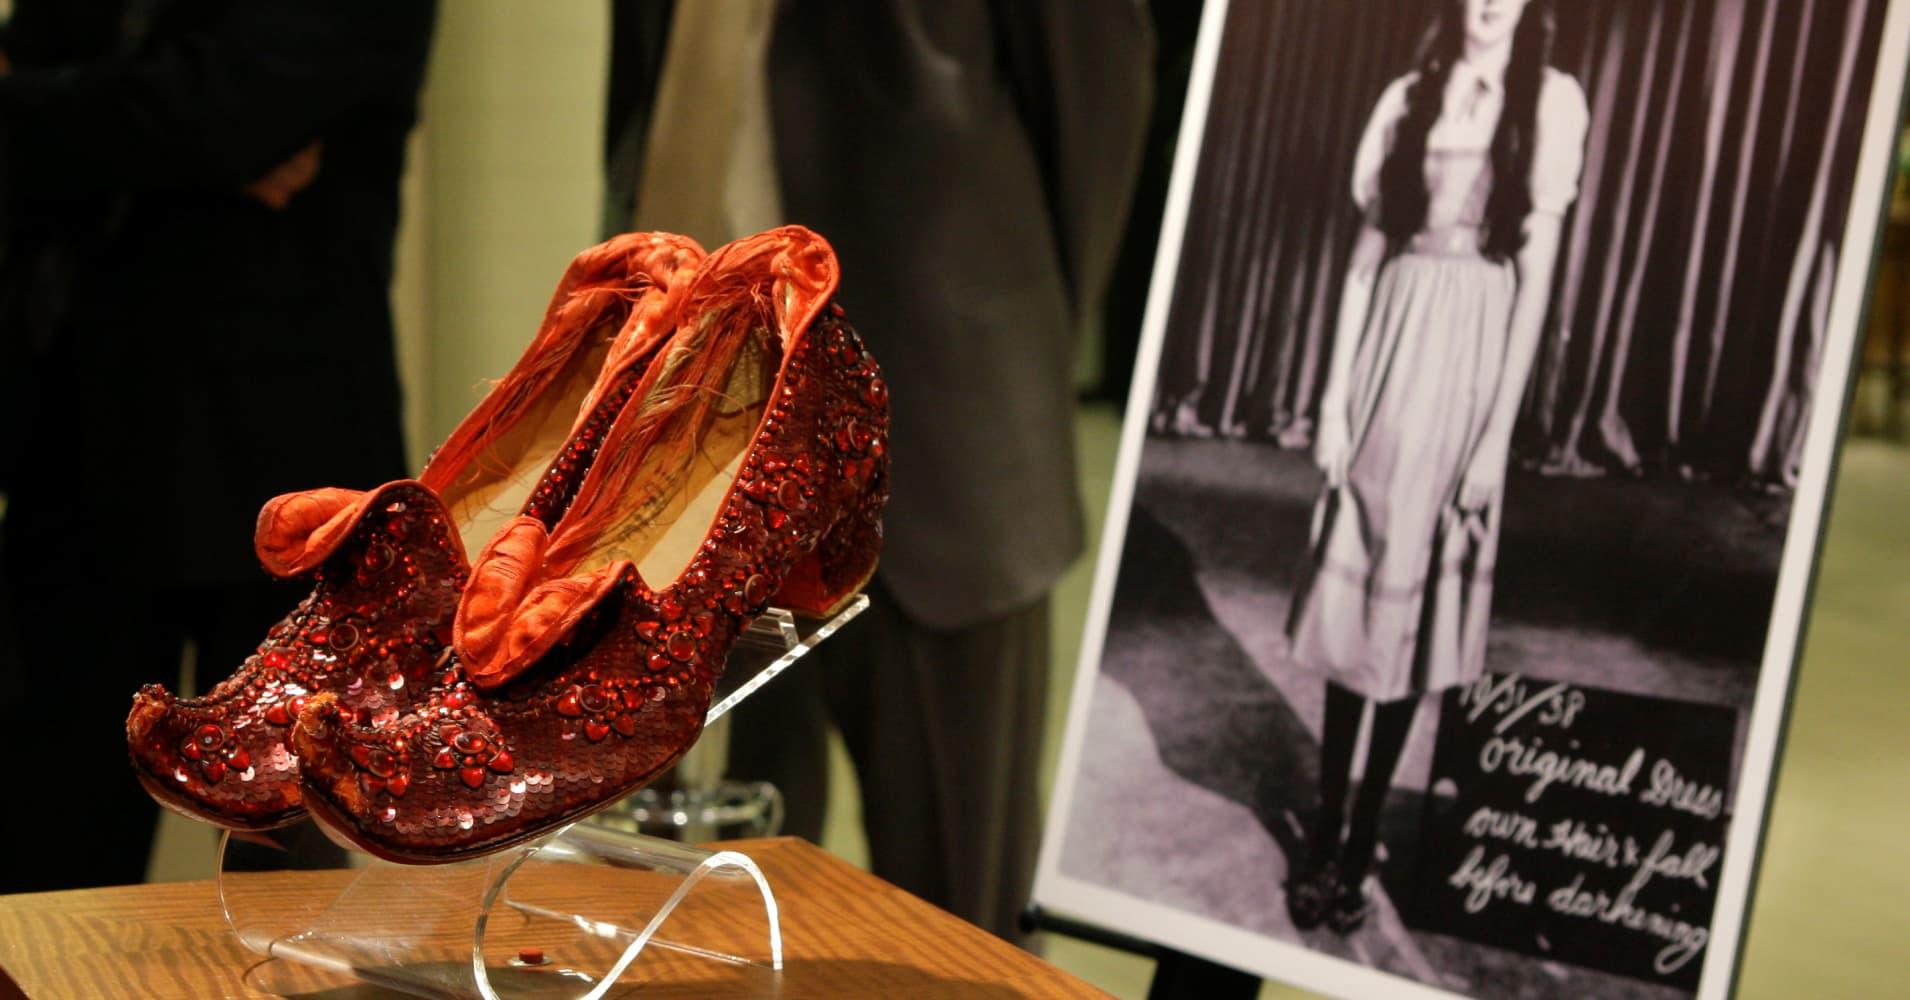 Stolen Ruby Slippers Worn By Judy Garland In Wizard Of Oz